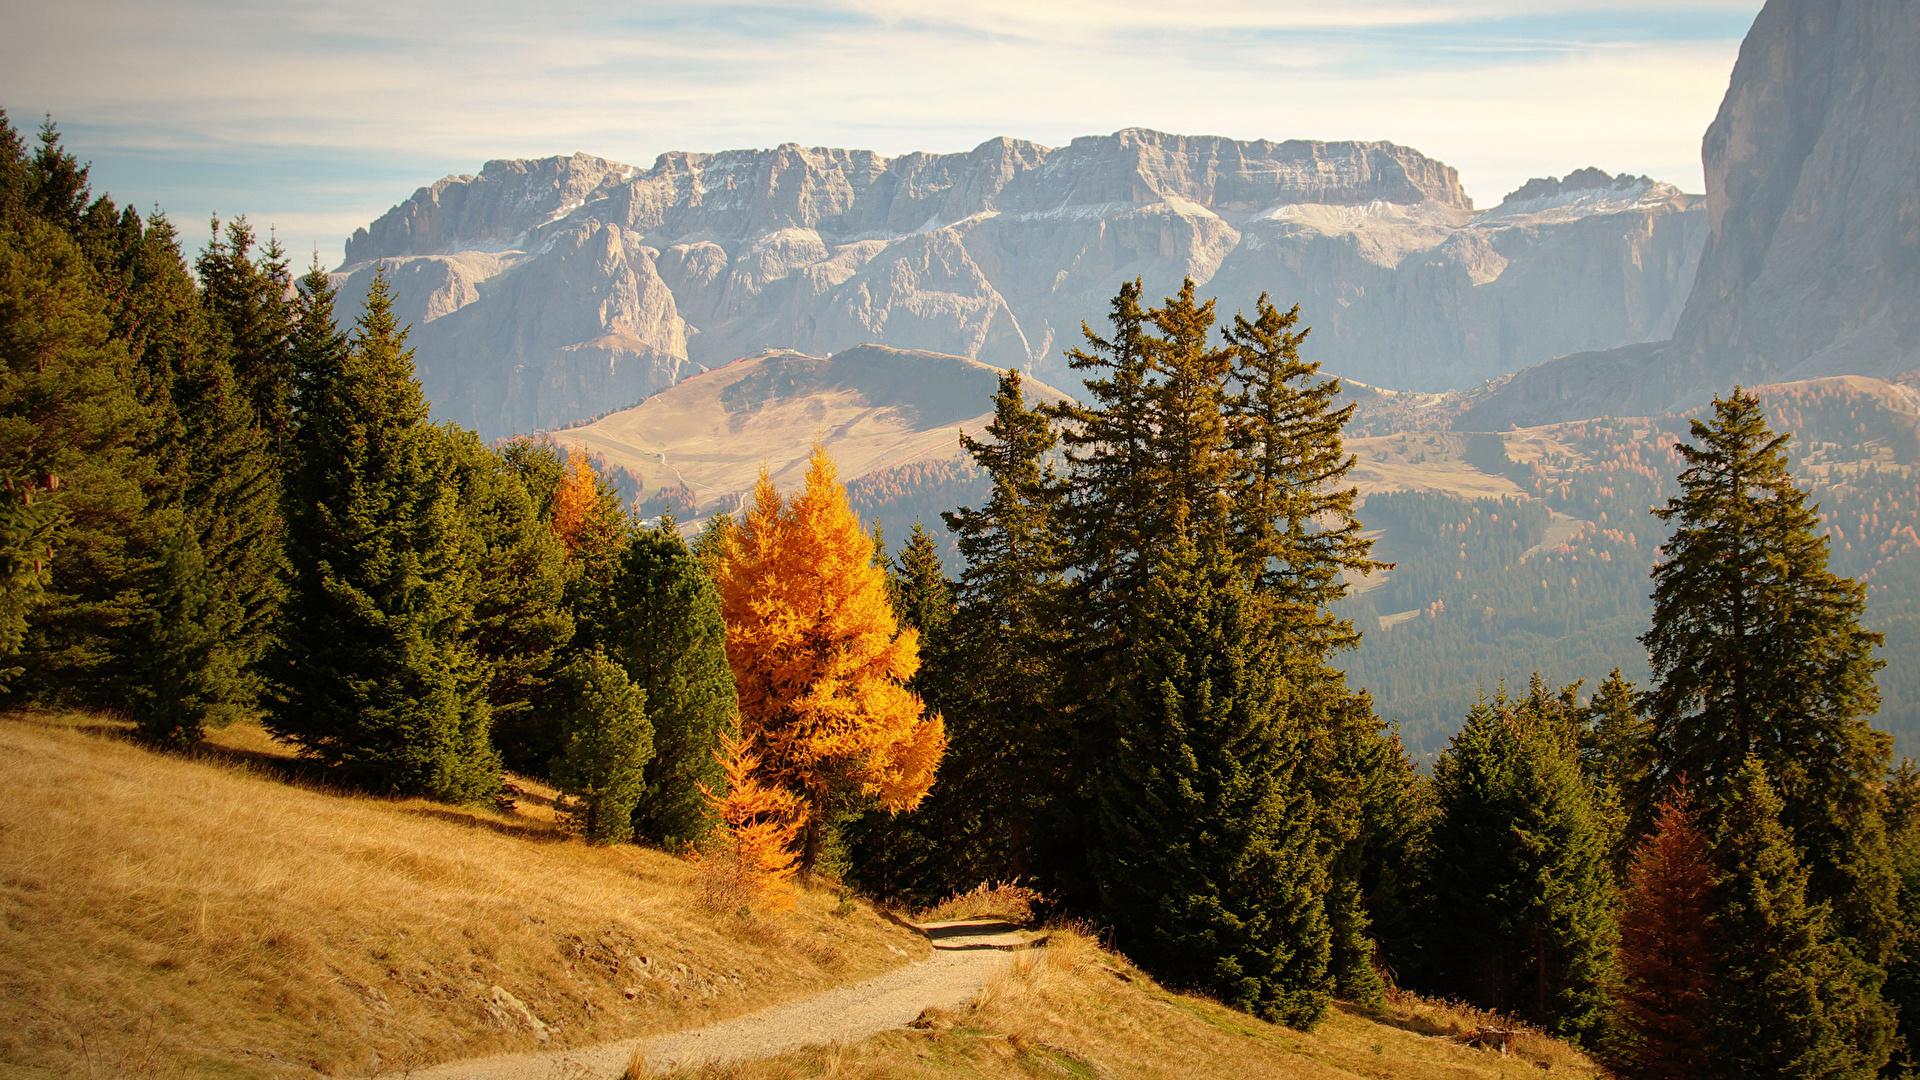 Images Italy Bolzano Trail Nature Spruce Autumn Mountains 1920x1080 1920x1080